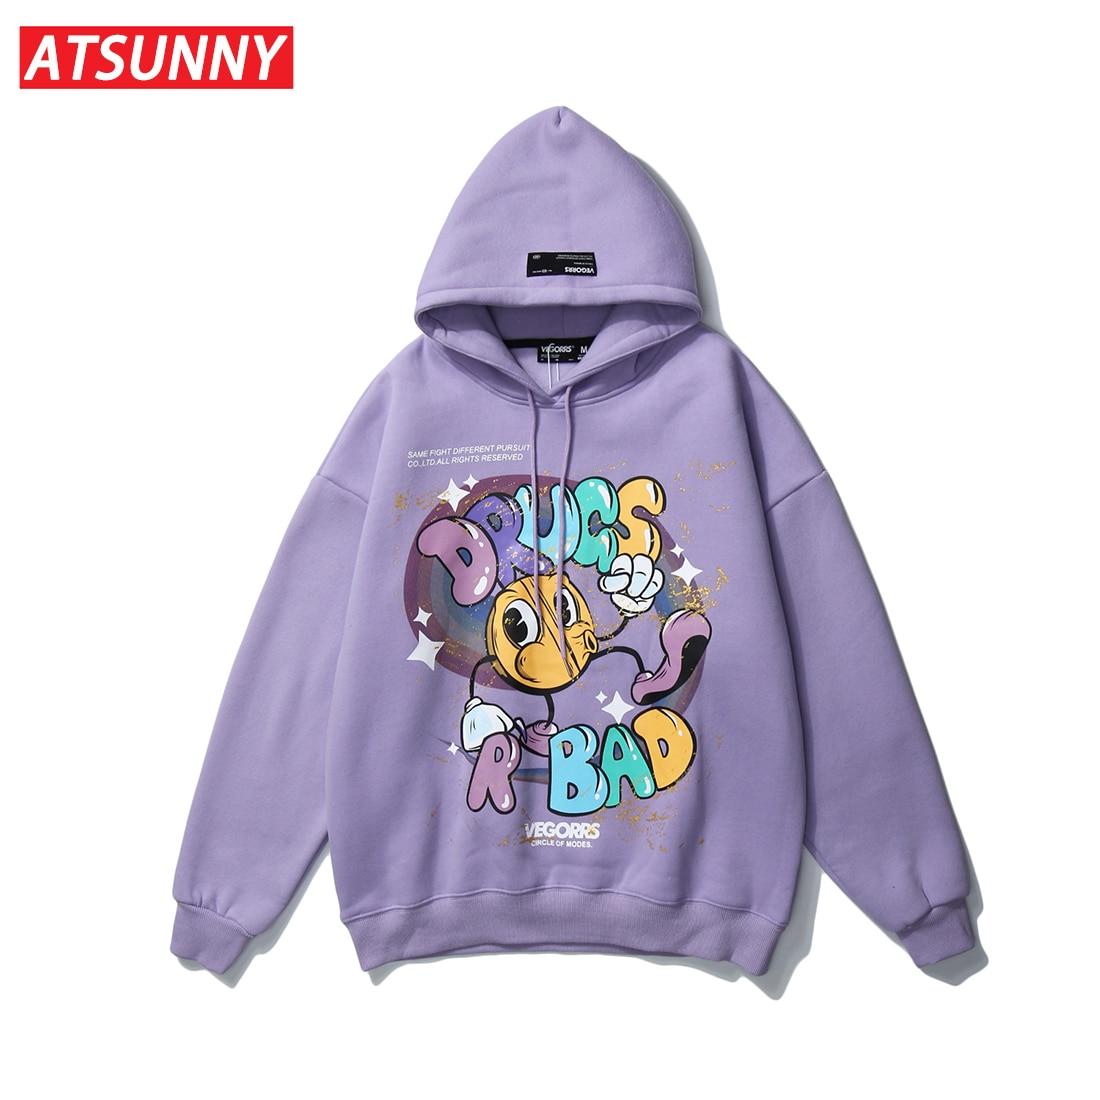 ATSUNNY Oversized Hip Hop Hoodie Sweatshirt Streetwear Harajuku Hoodie Pullover Autumn Cotton Cartoon Anime Drugs R Bad Hoodie